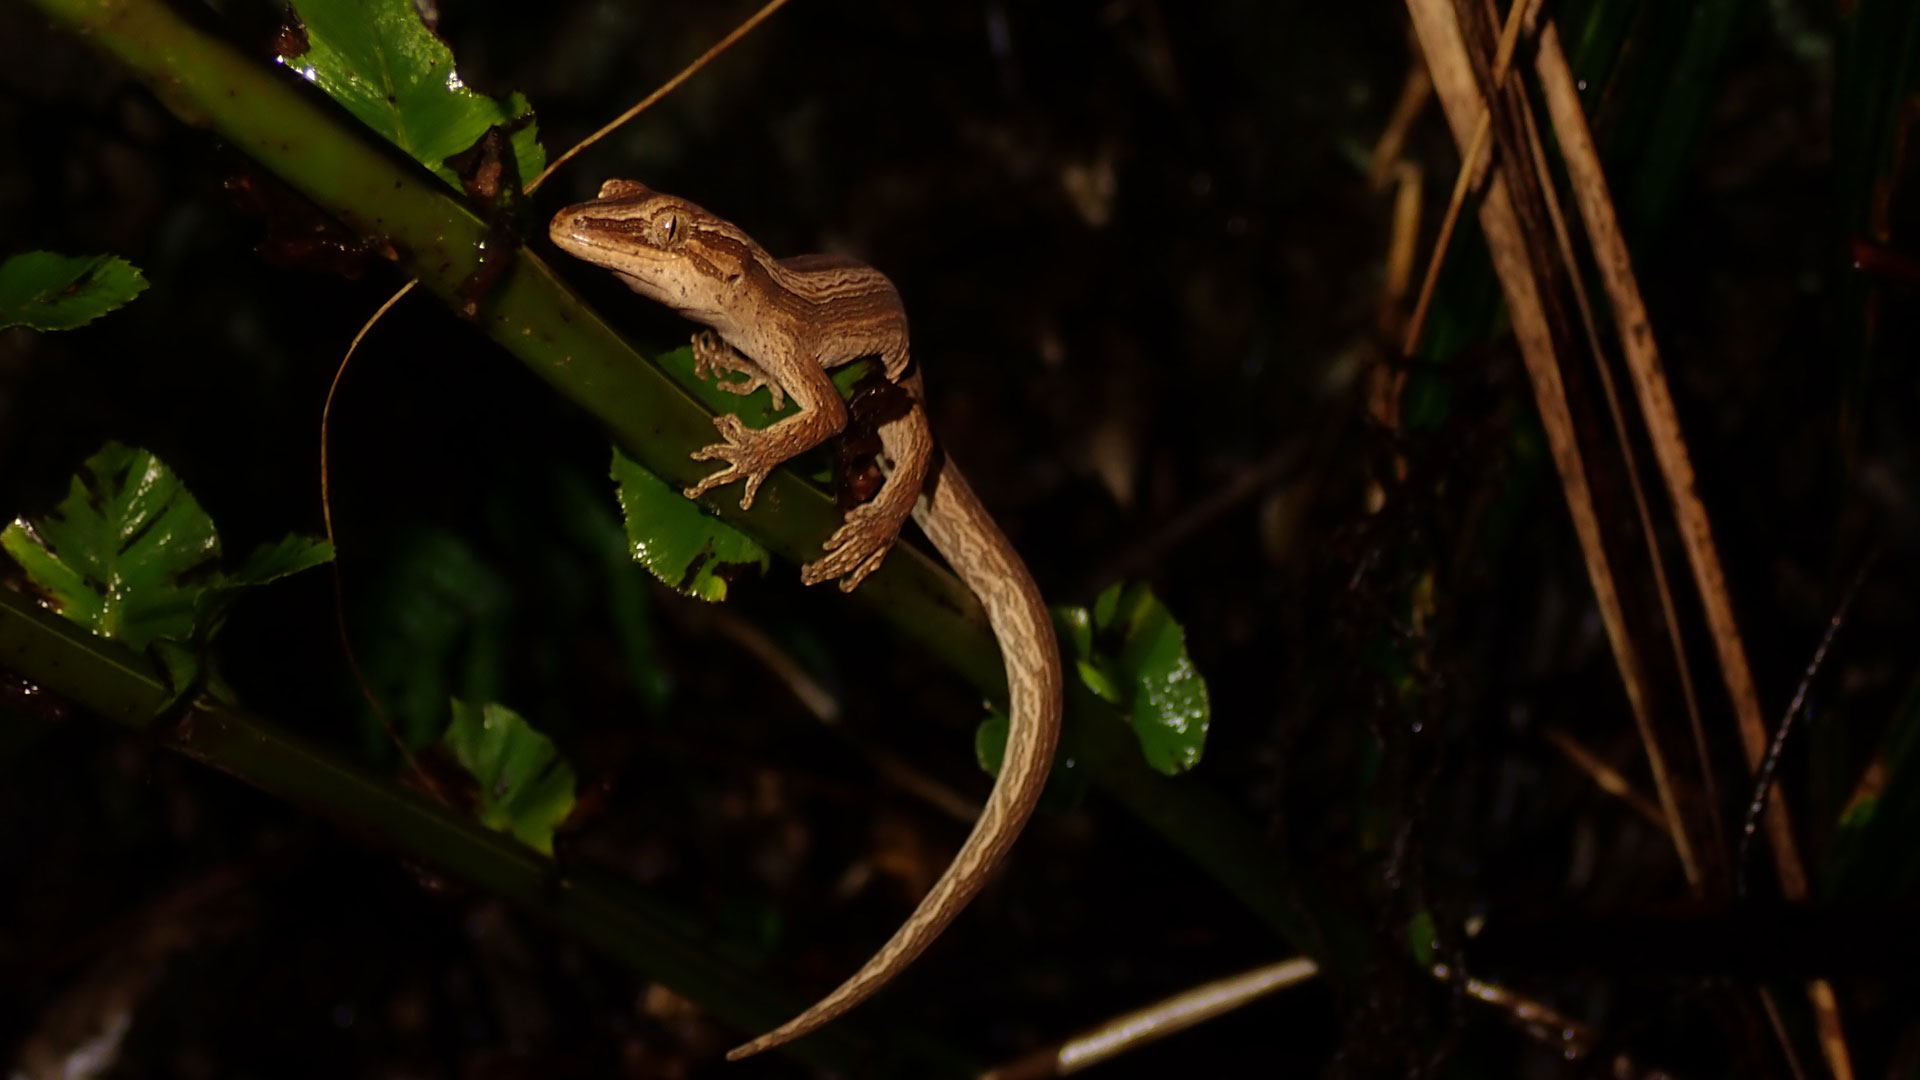 https://rfacdn.nz/zoo/assets/media/northern-striped-gecko-gallery-4.jpg